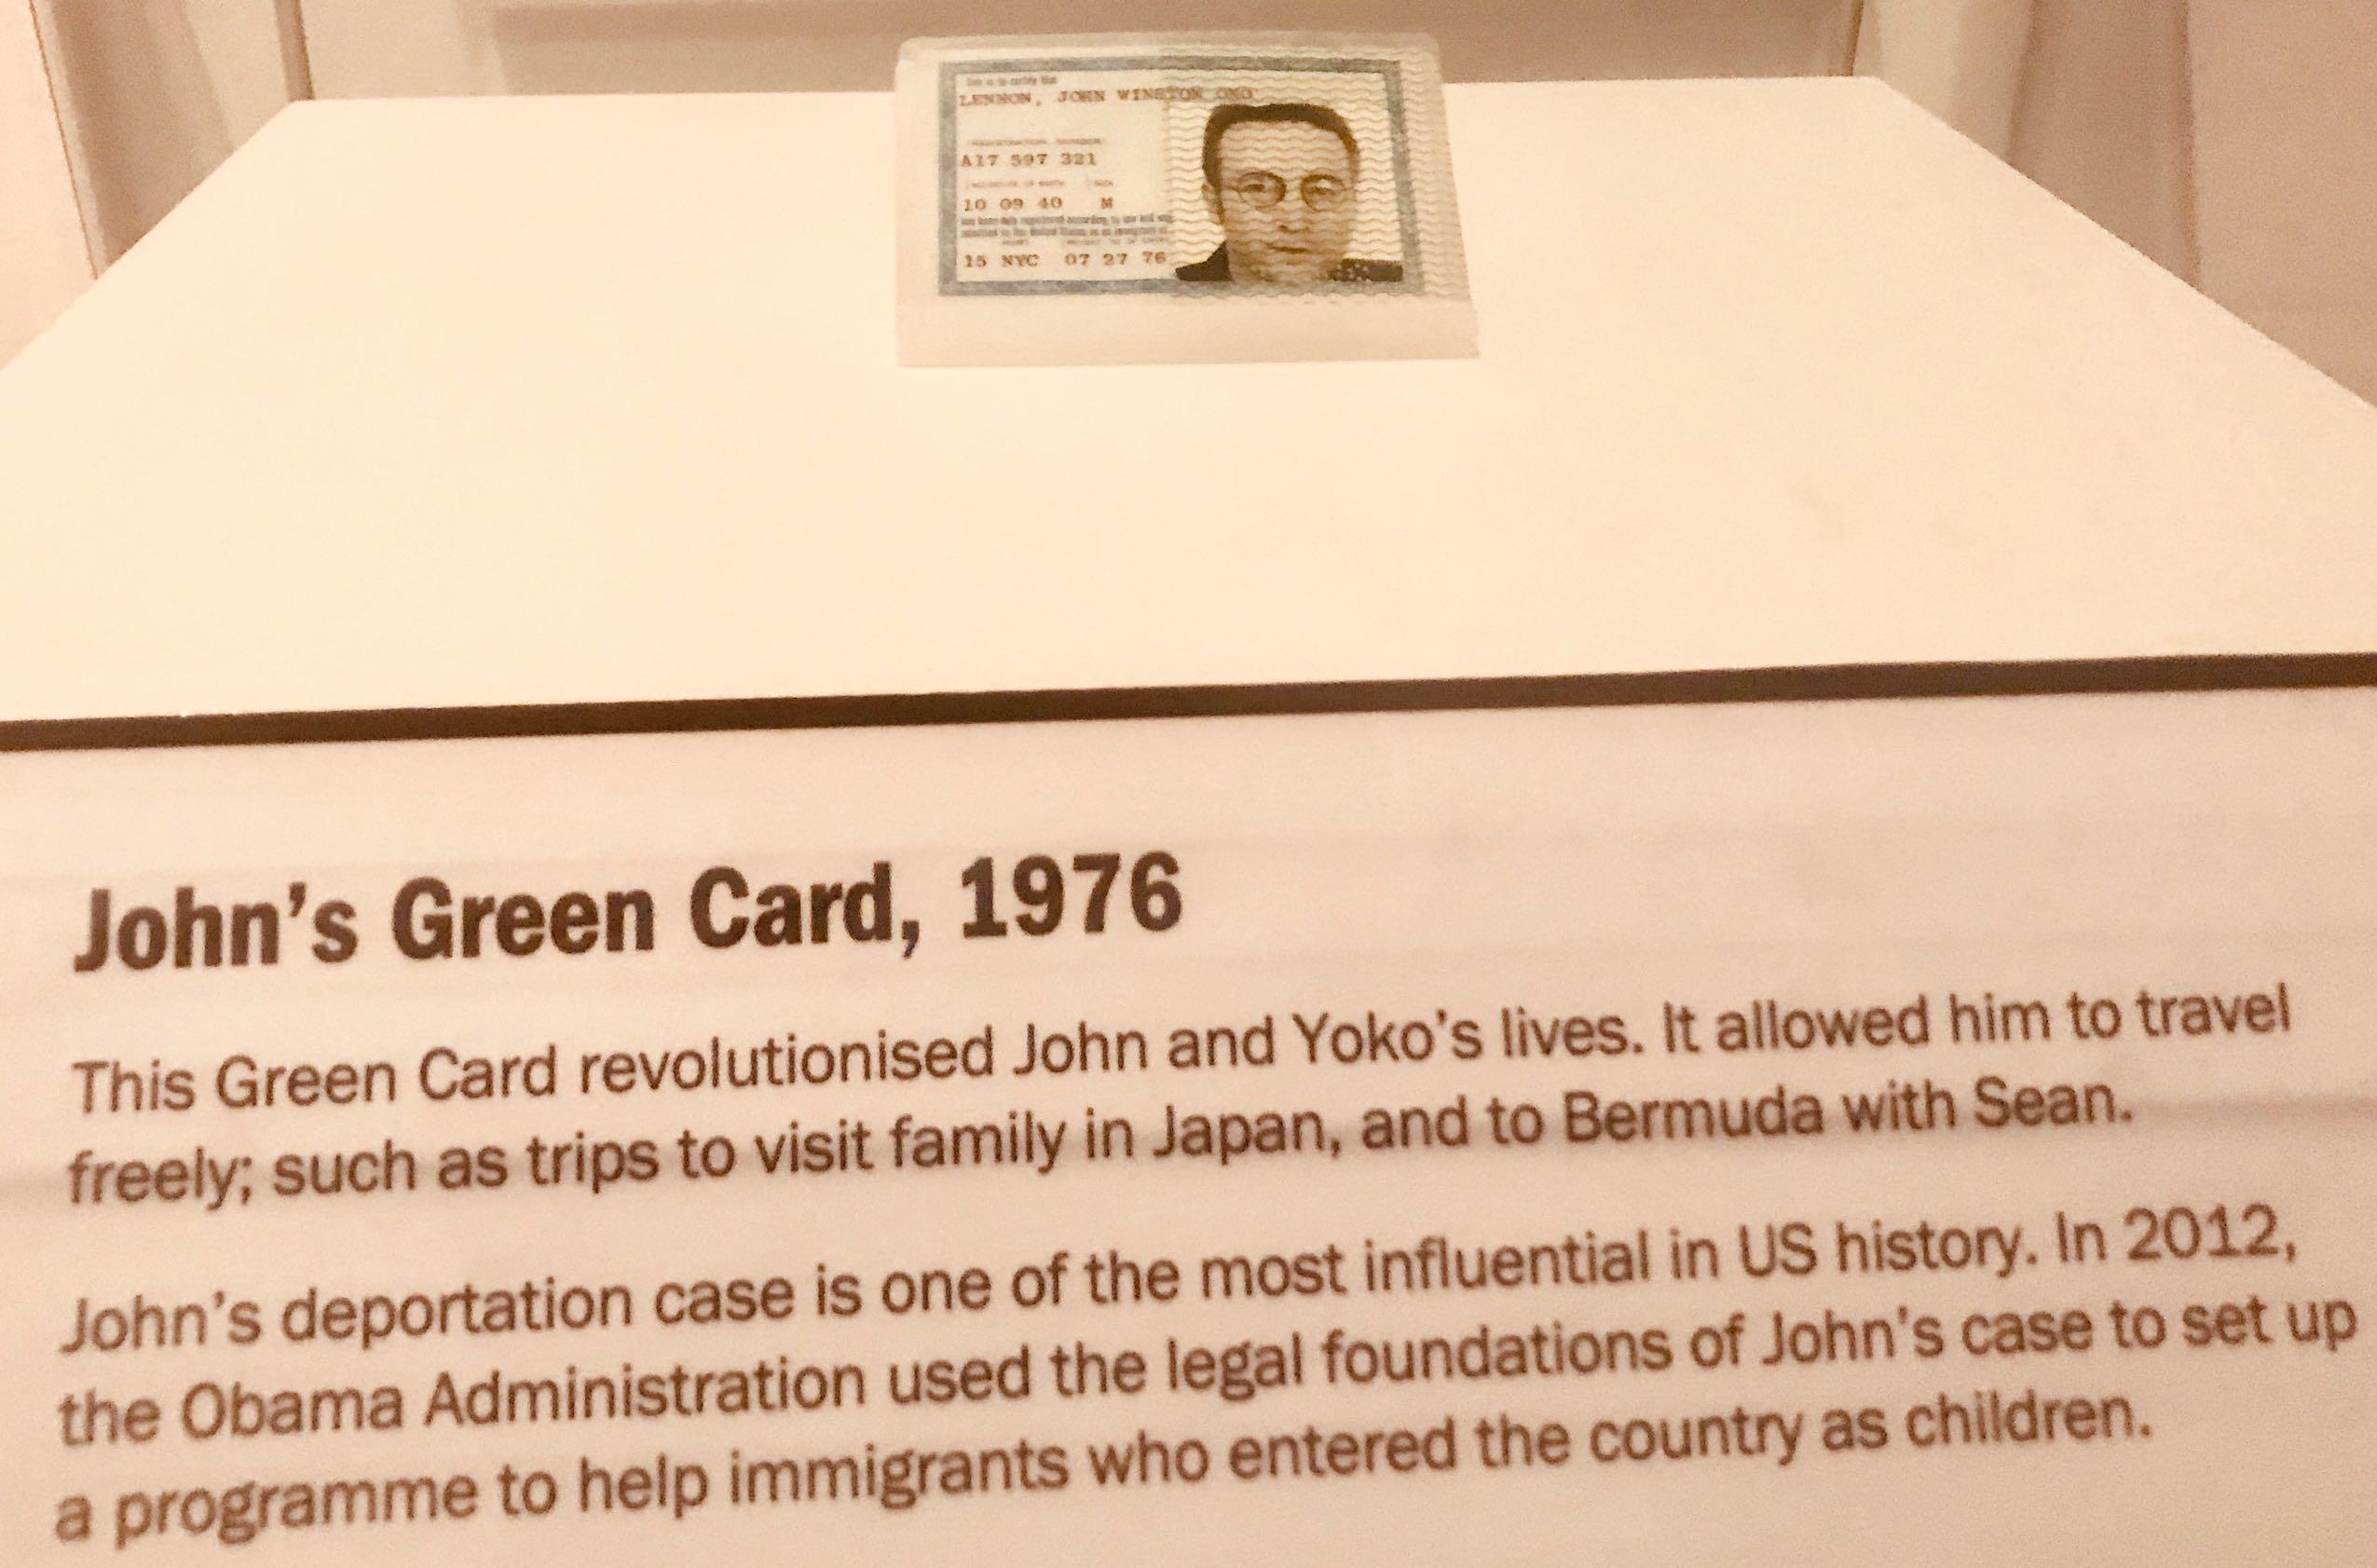 John Lennon's Green Card Double Fantasy Exhibition Liverpool